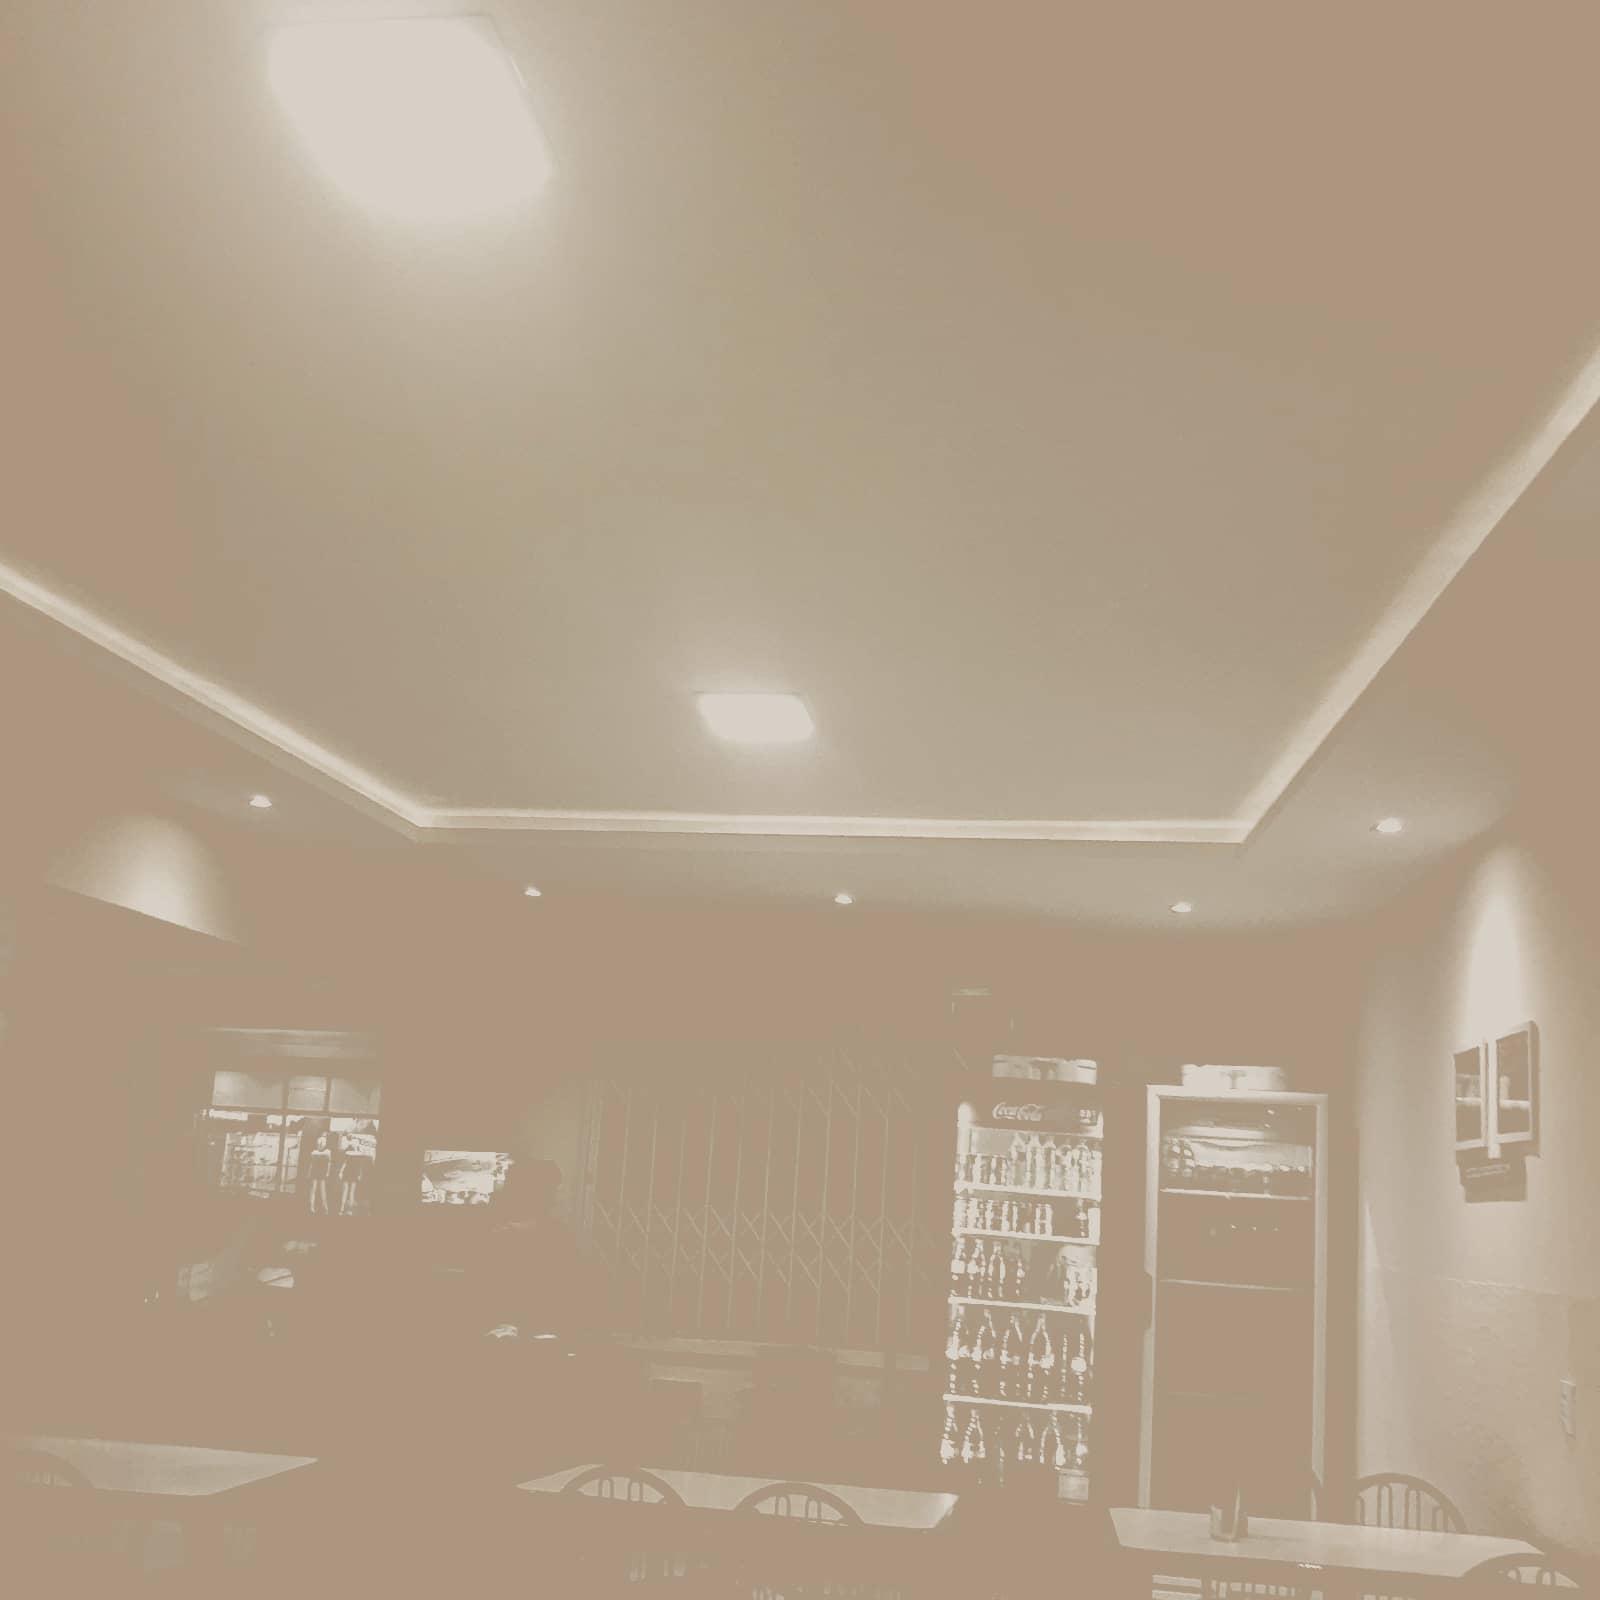 Sanca aberta com drywall